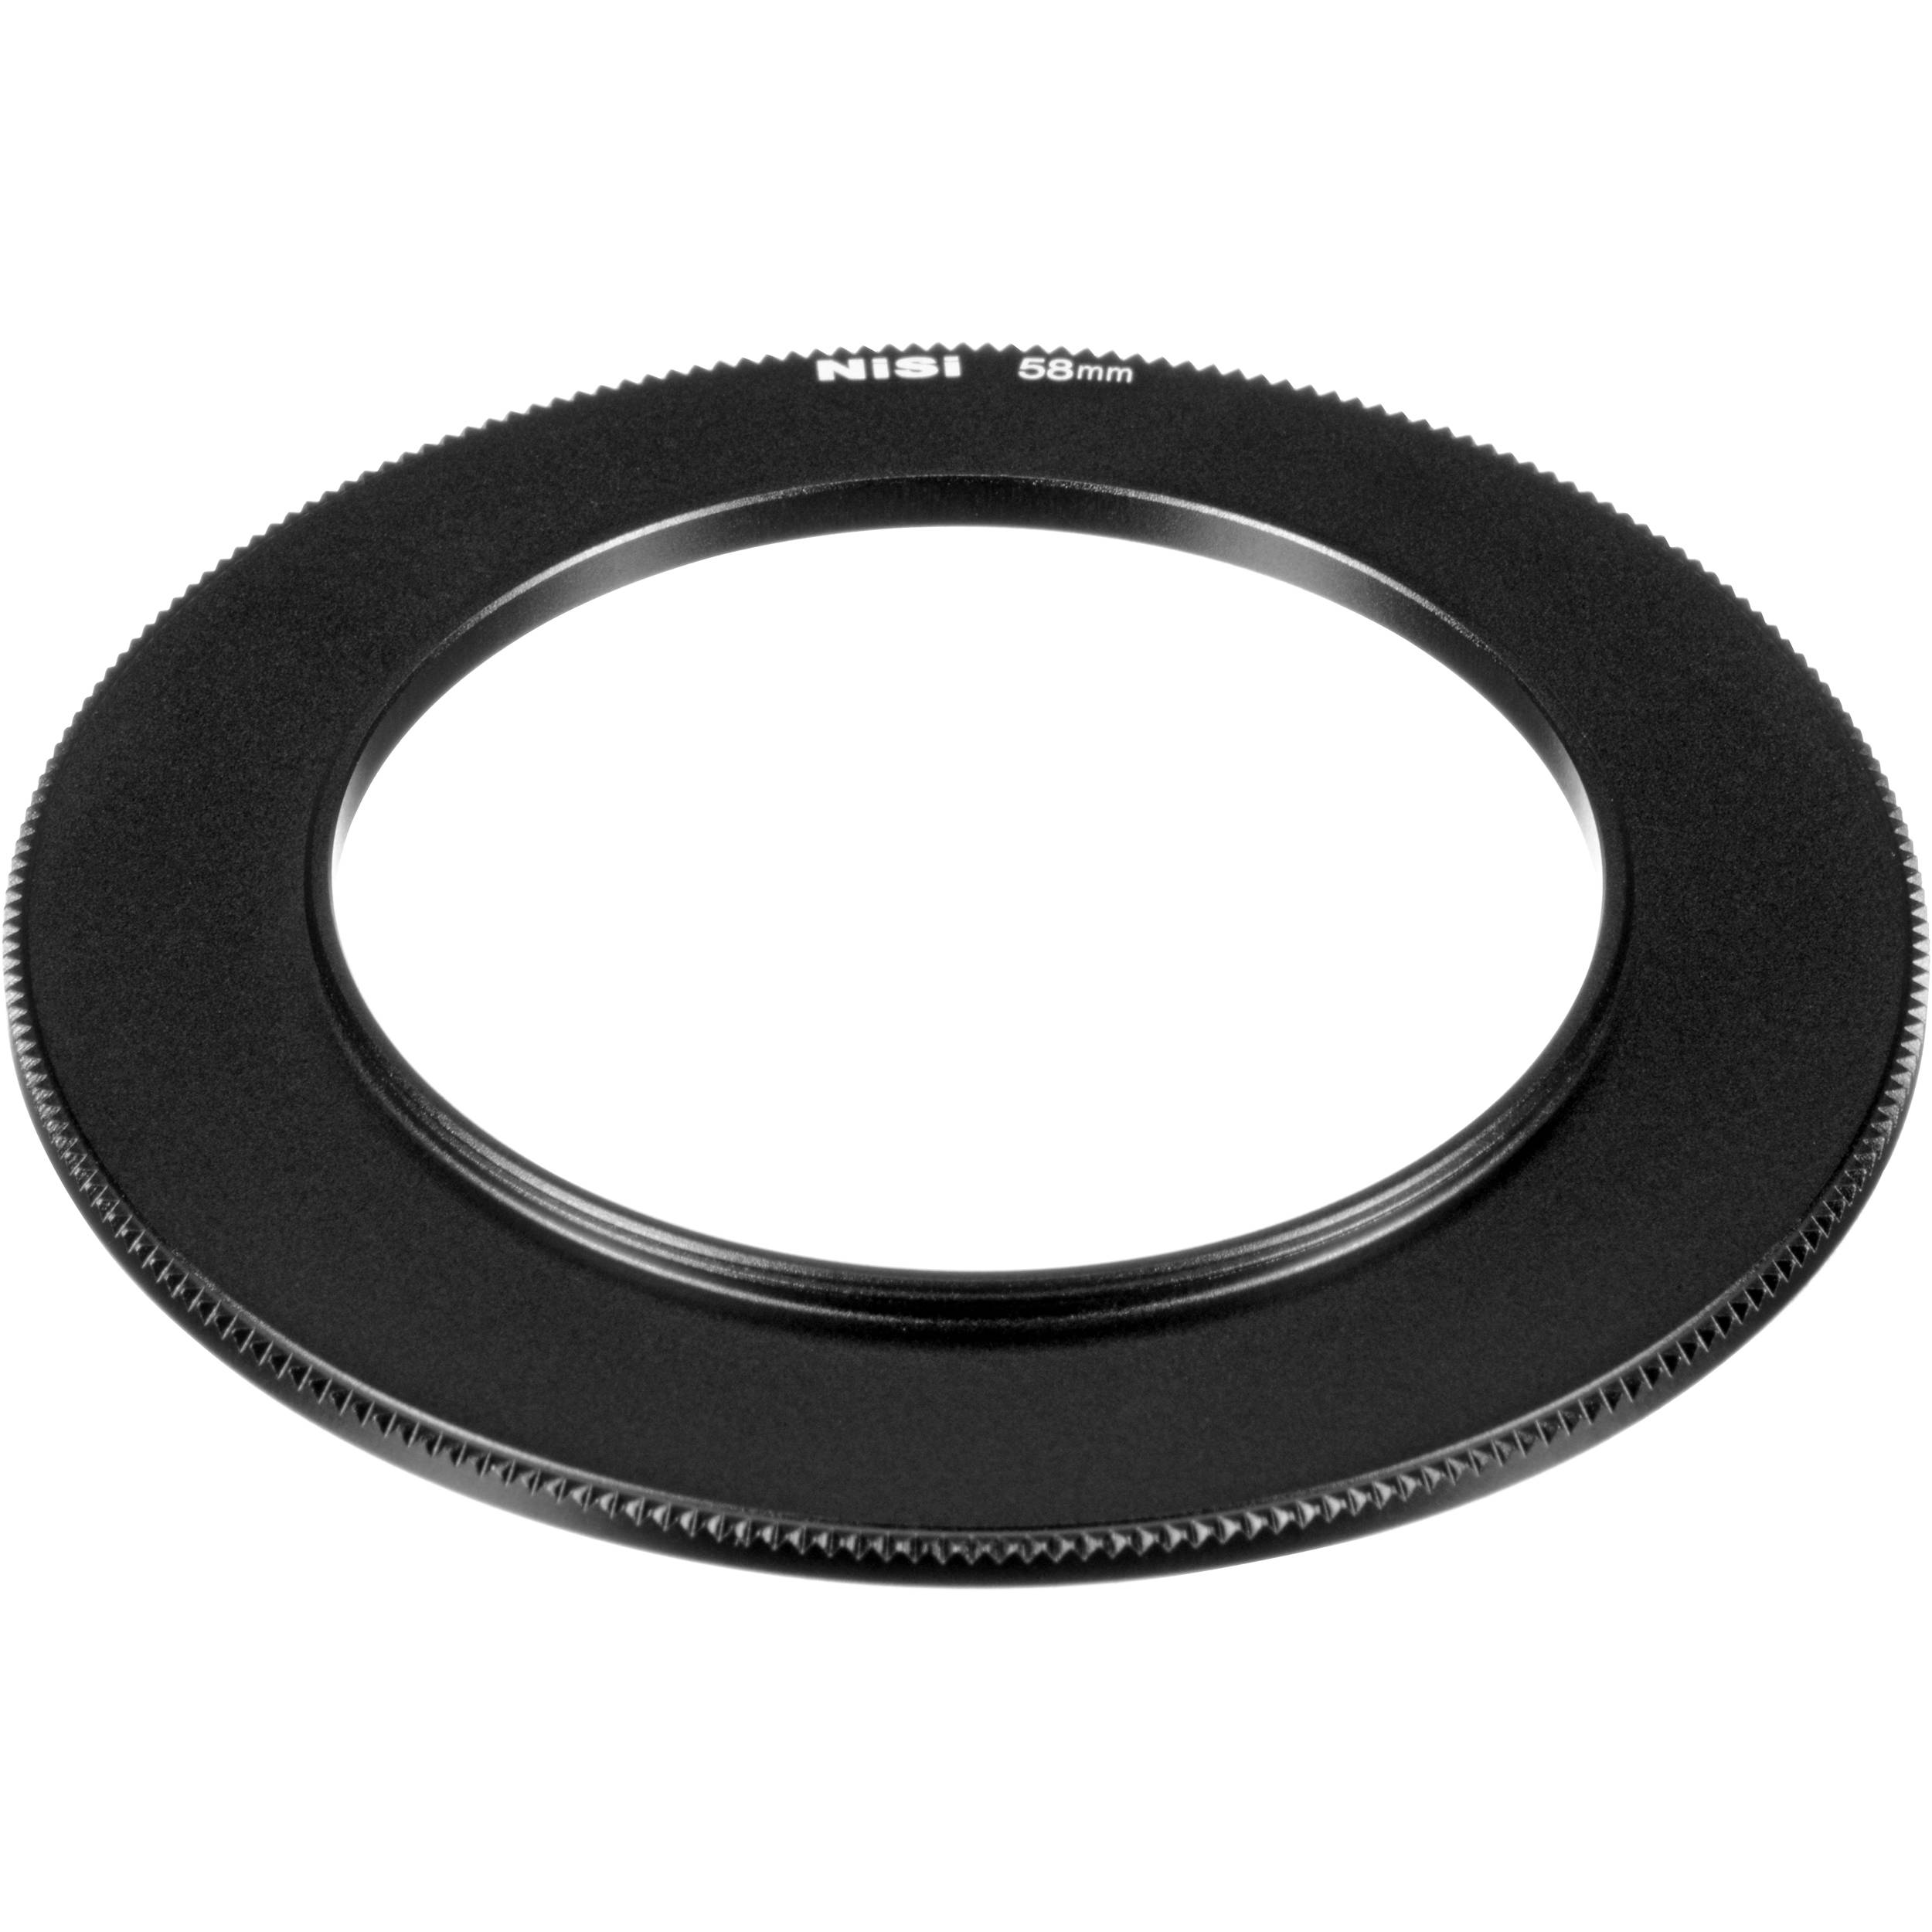 Nisi 58 82mm Step Up Ring For C4 Cinema Filter Nip V5 Ad58 Bh 100mm Aluminium Holder Kit Pro And